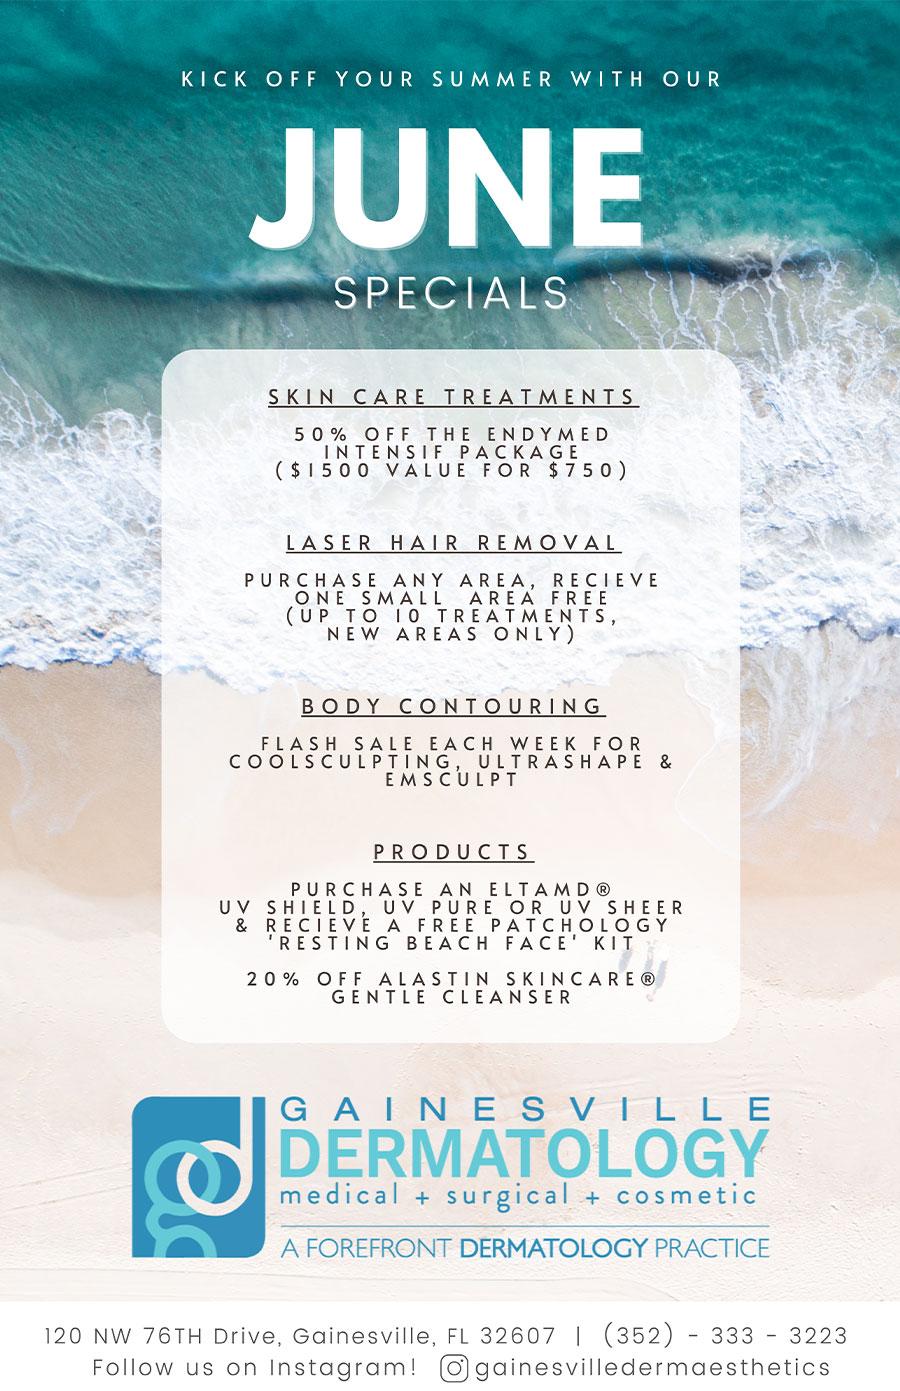 Dermatology Specials for June 2021 in Gainesville